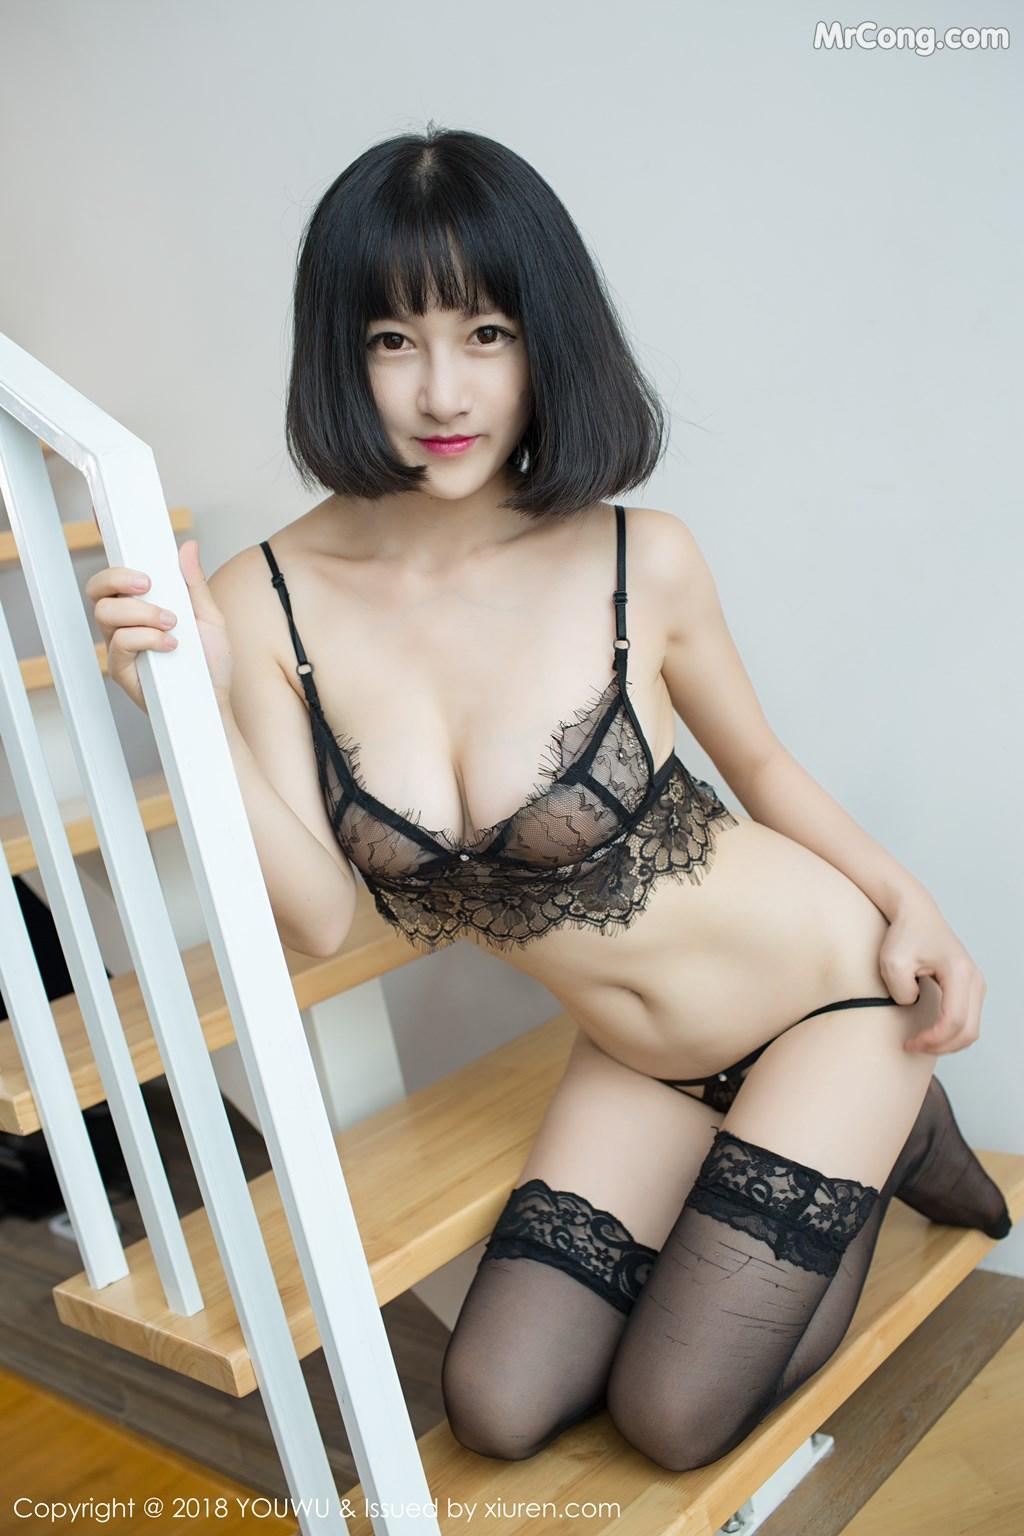 Image YouWu-Vol.114-MrCong.com-009 in post YouWu Vol.114: Người mẫu Xiao Tan Ge (小探戈-) (45 ảnh)